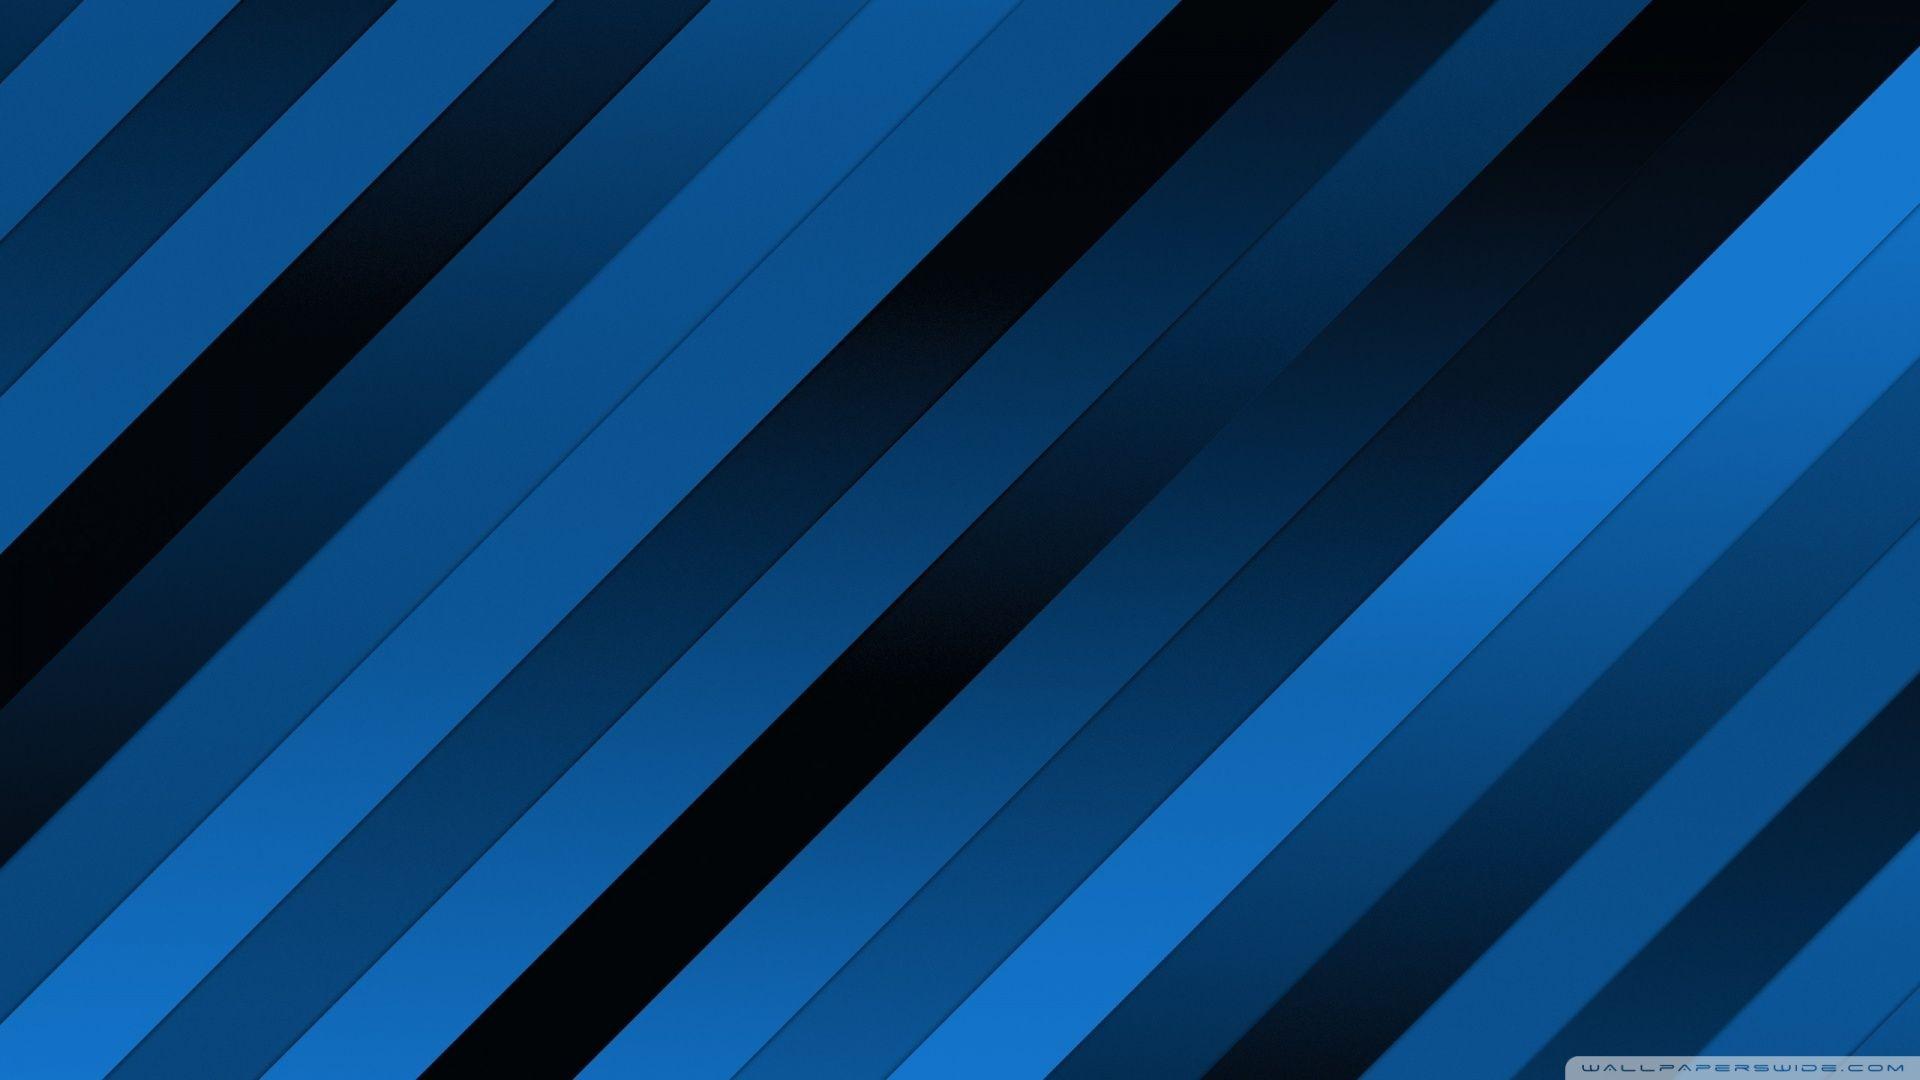 Blue Line laptop background